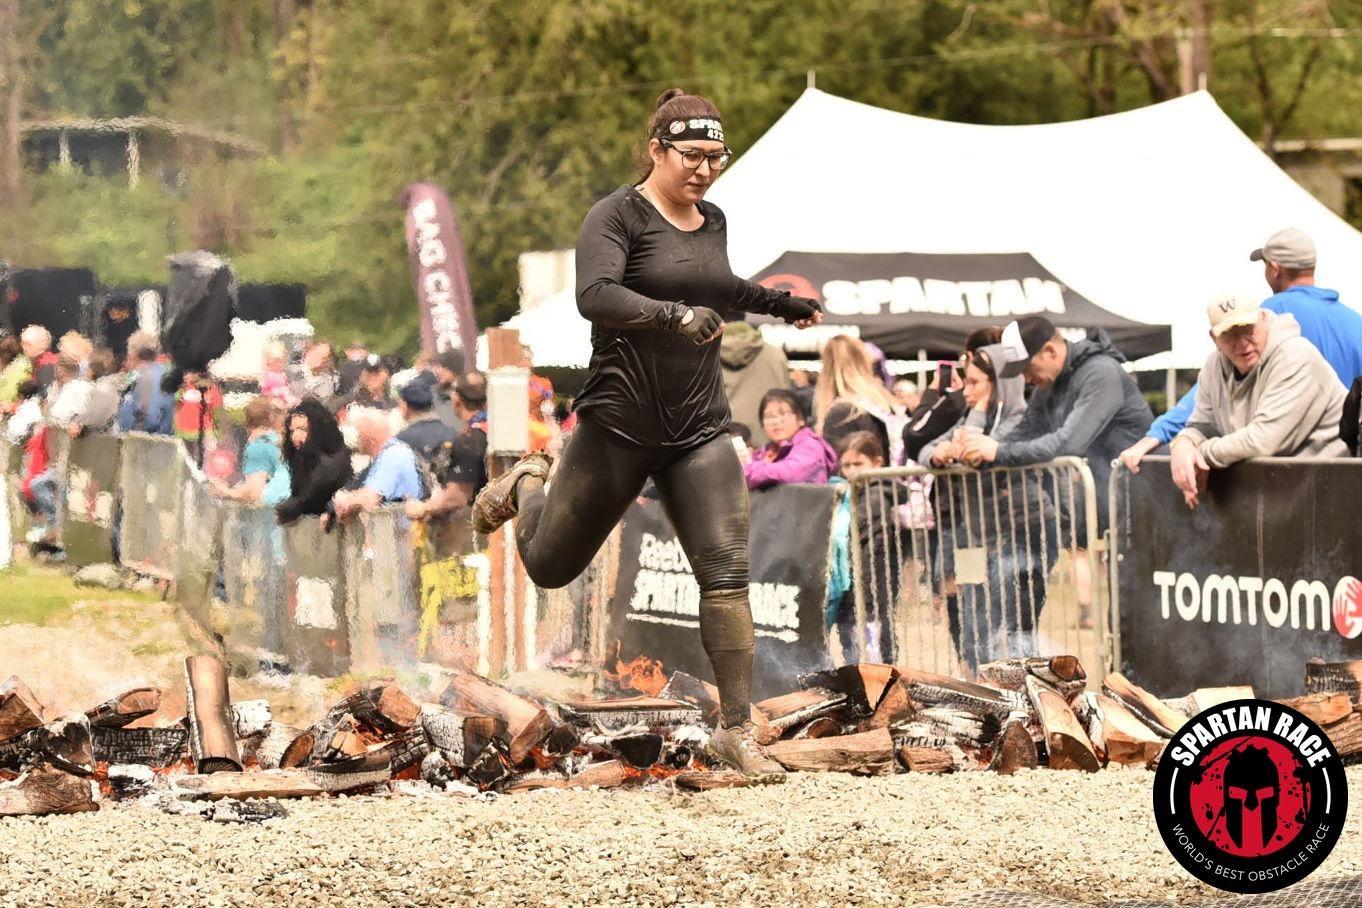 Seattle Spartan Super (Championship Series) 2017. Photo credit: Spartan Race